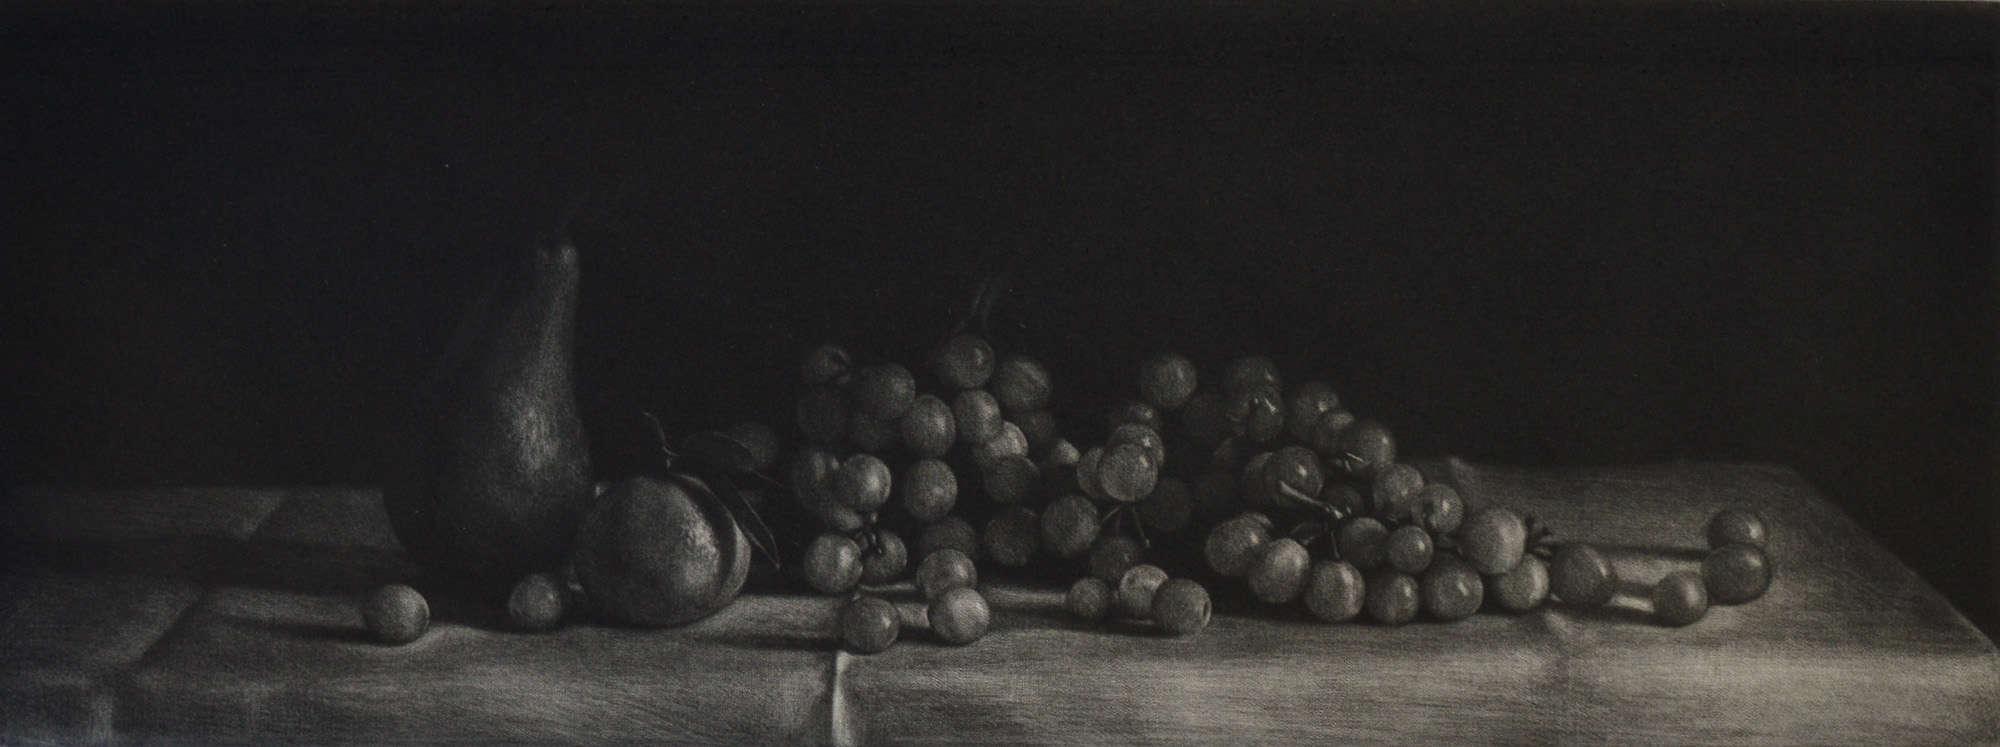 """Grapes"" - black and white still life with grapes, pear and mandarin on linen cloth. Original print mezzotint by painter-printmaker Marina Kim"